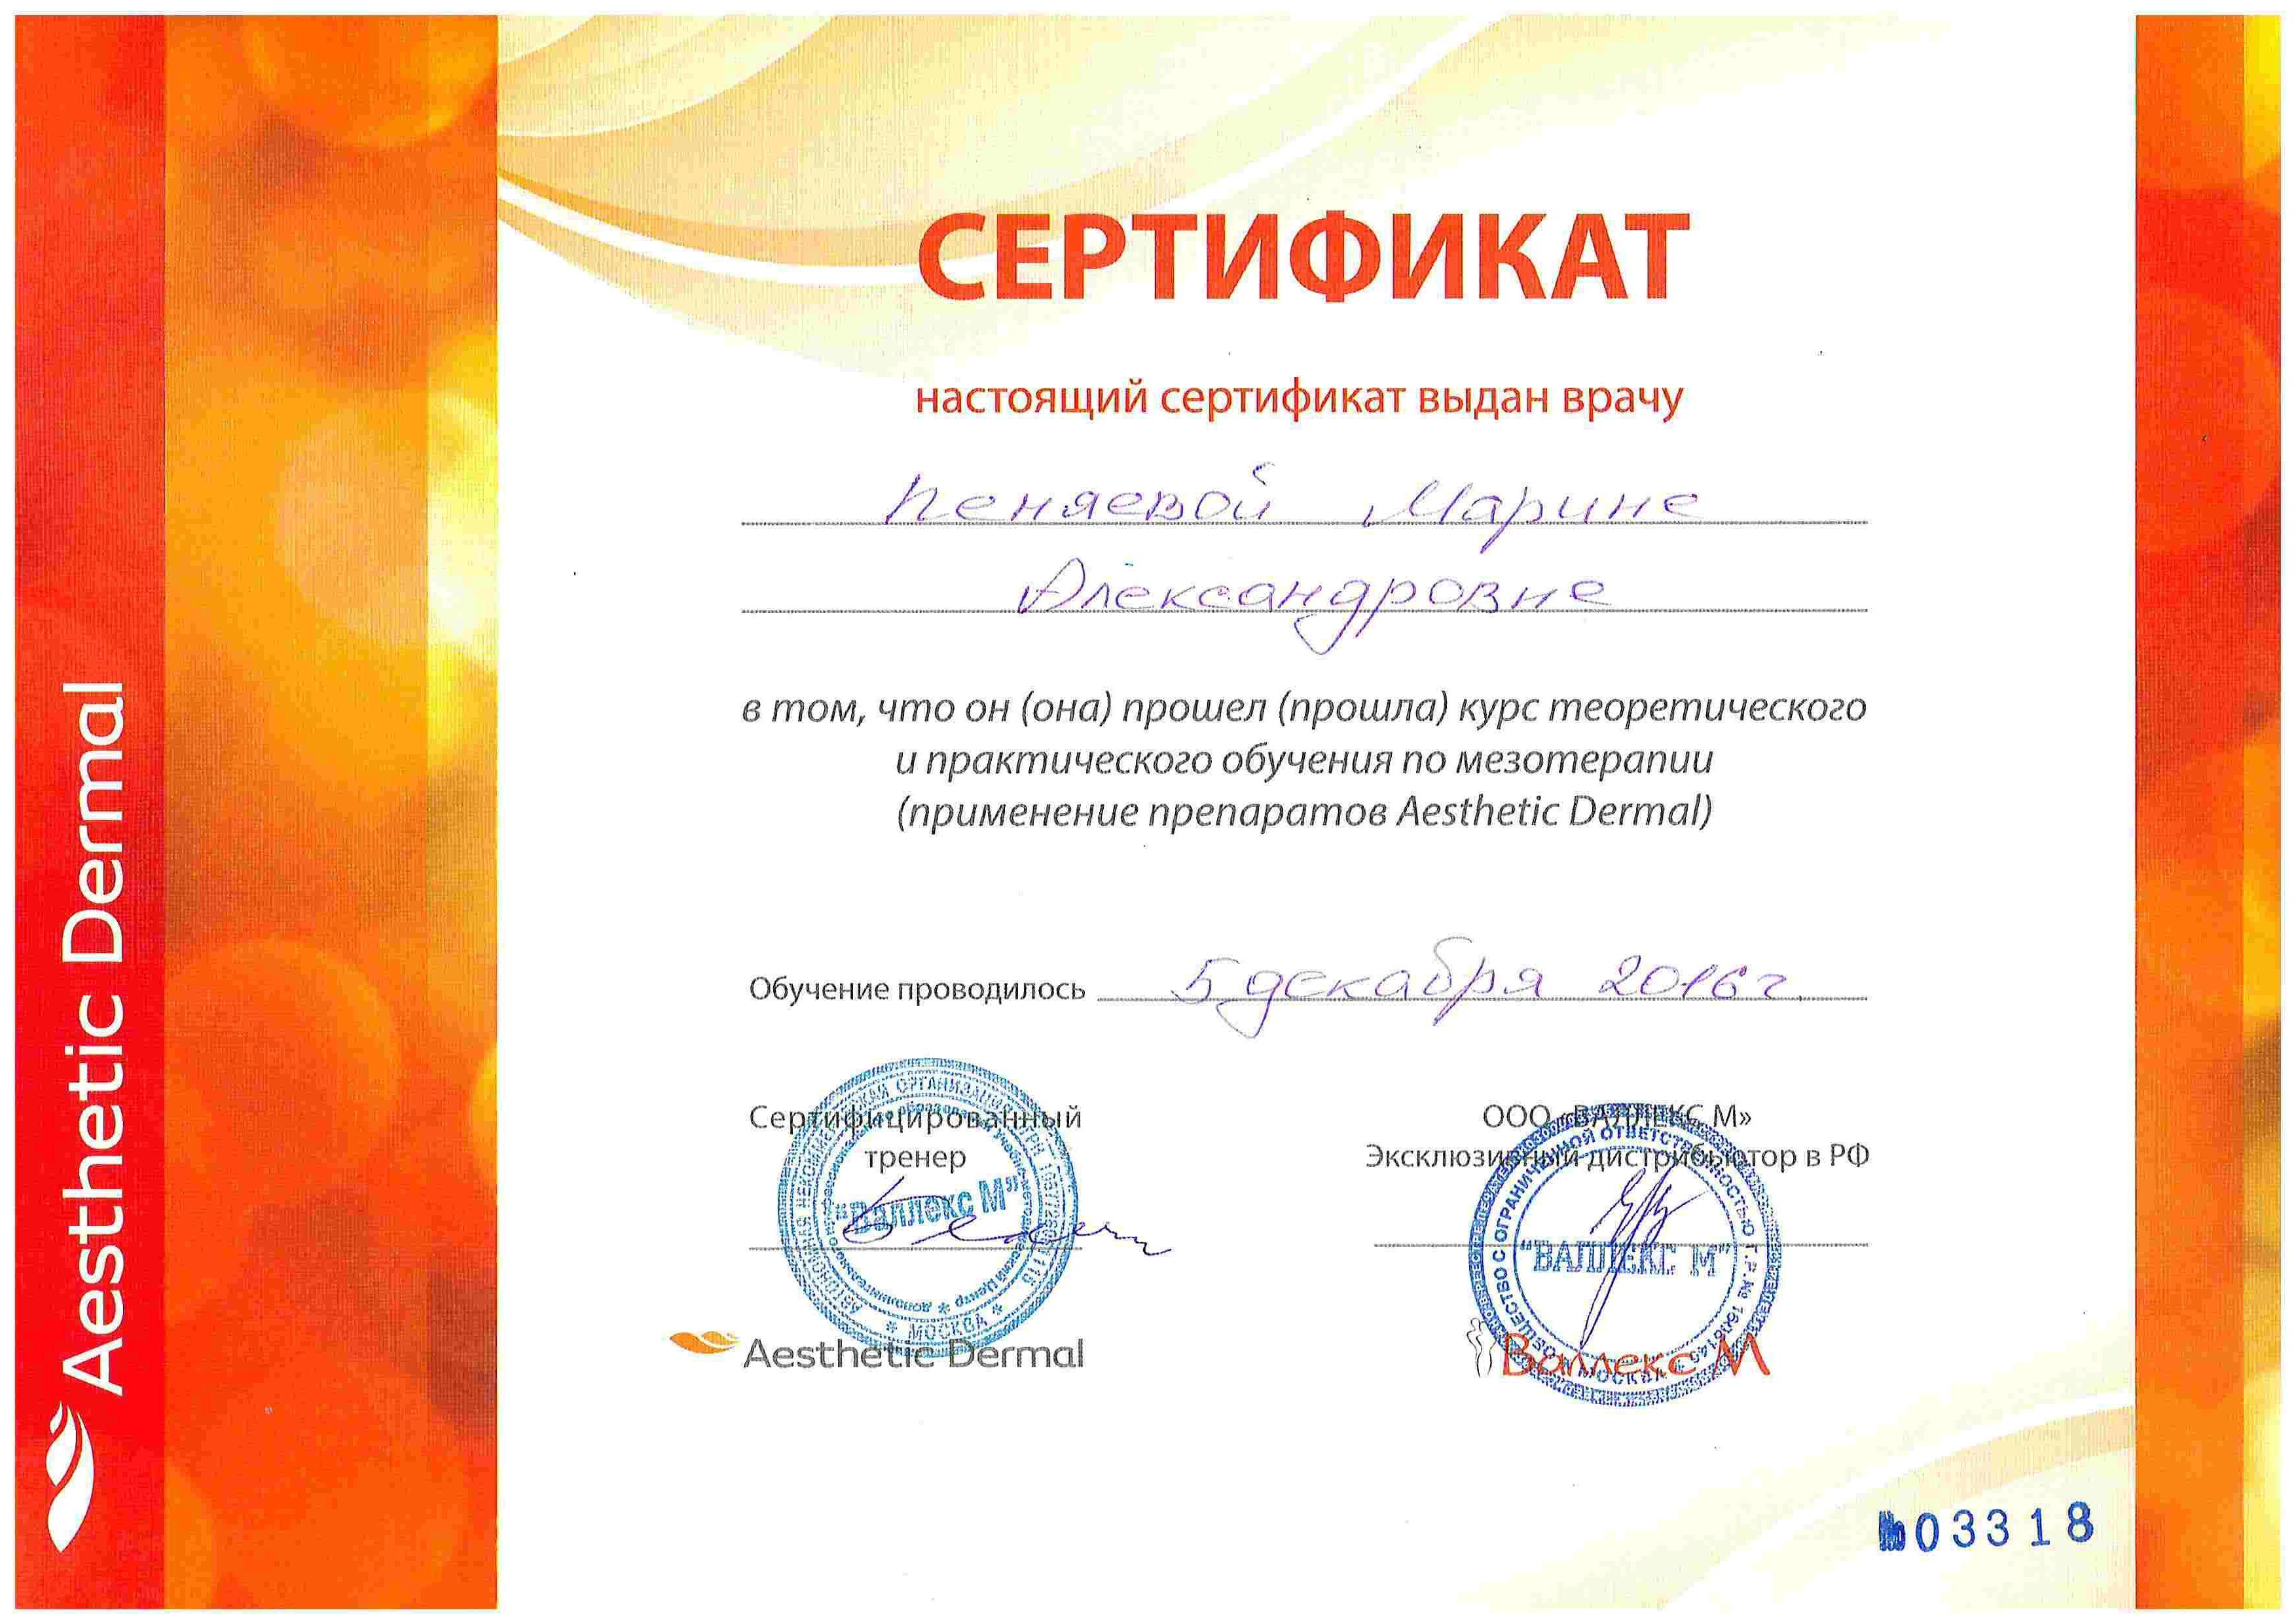 Сертификат — Применение препаратов Aesthetic Dermal. Пеняева Марина Александровна